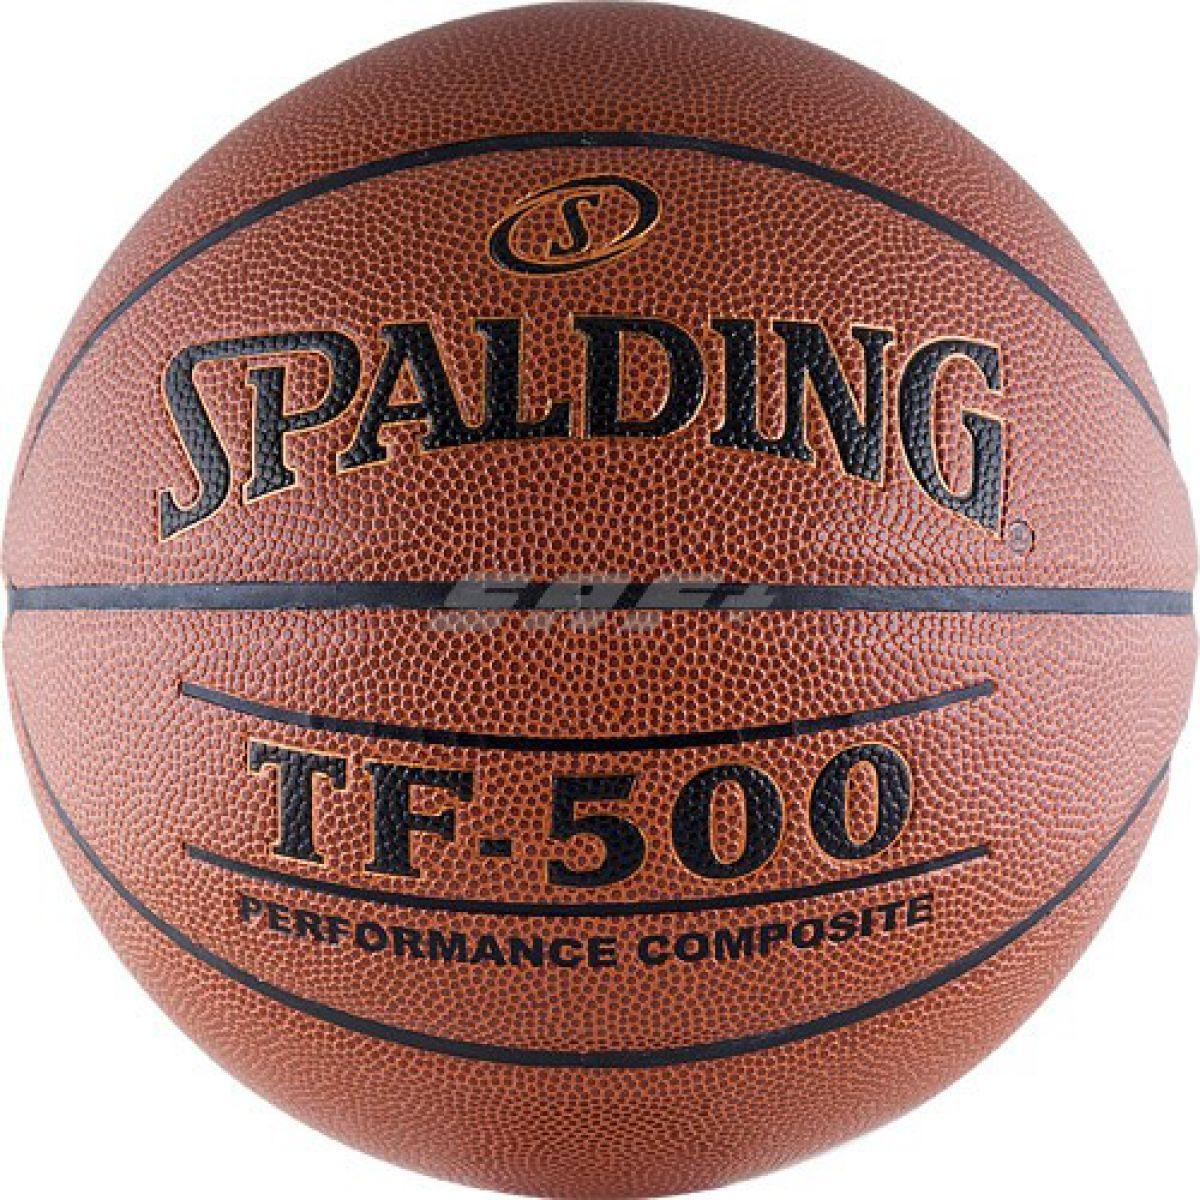 Мяч баскетбольный Spalding TF-500 Performance